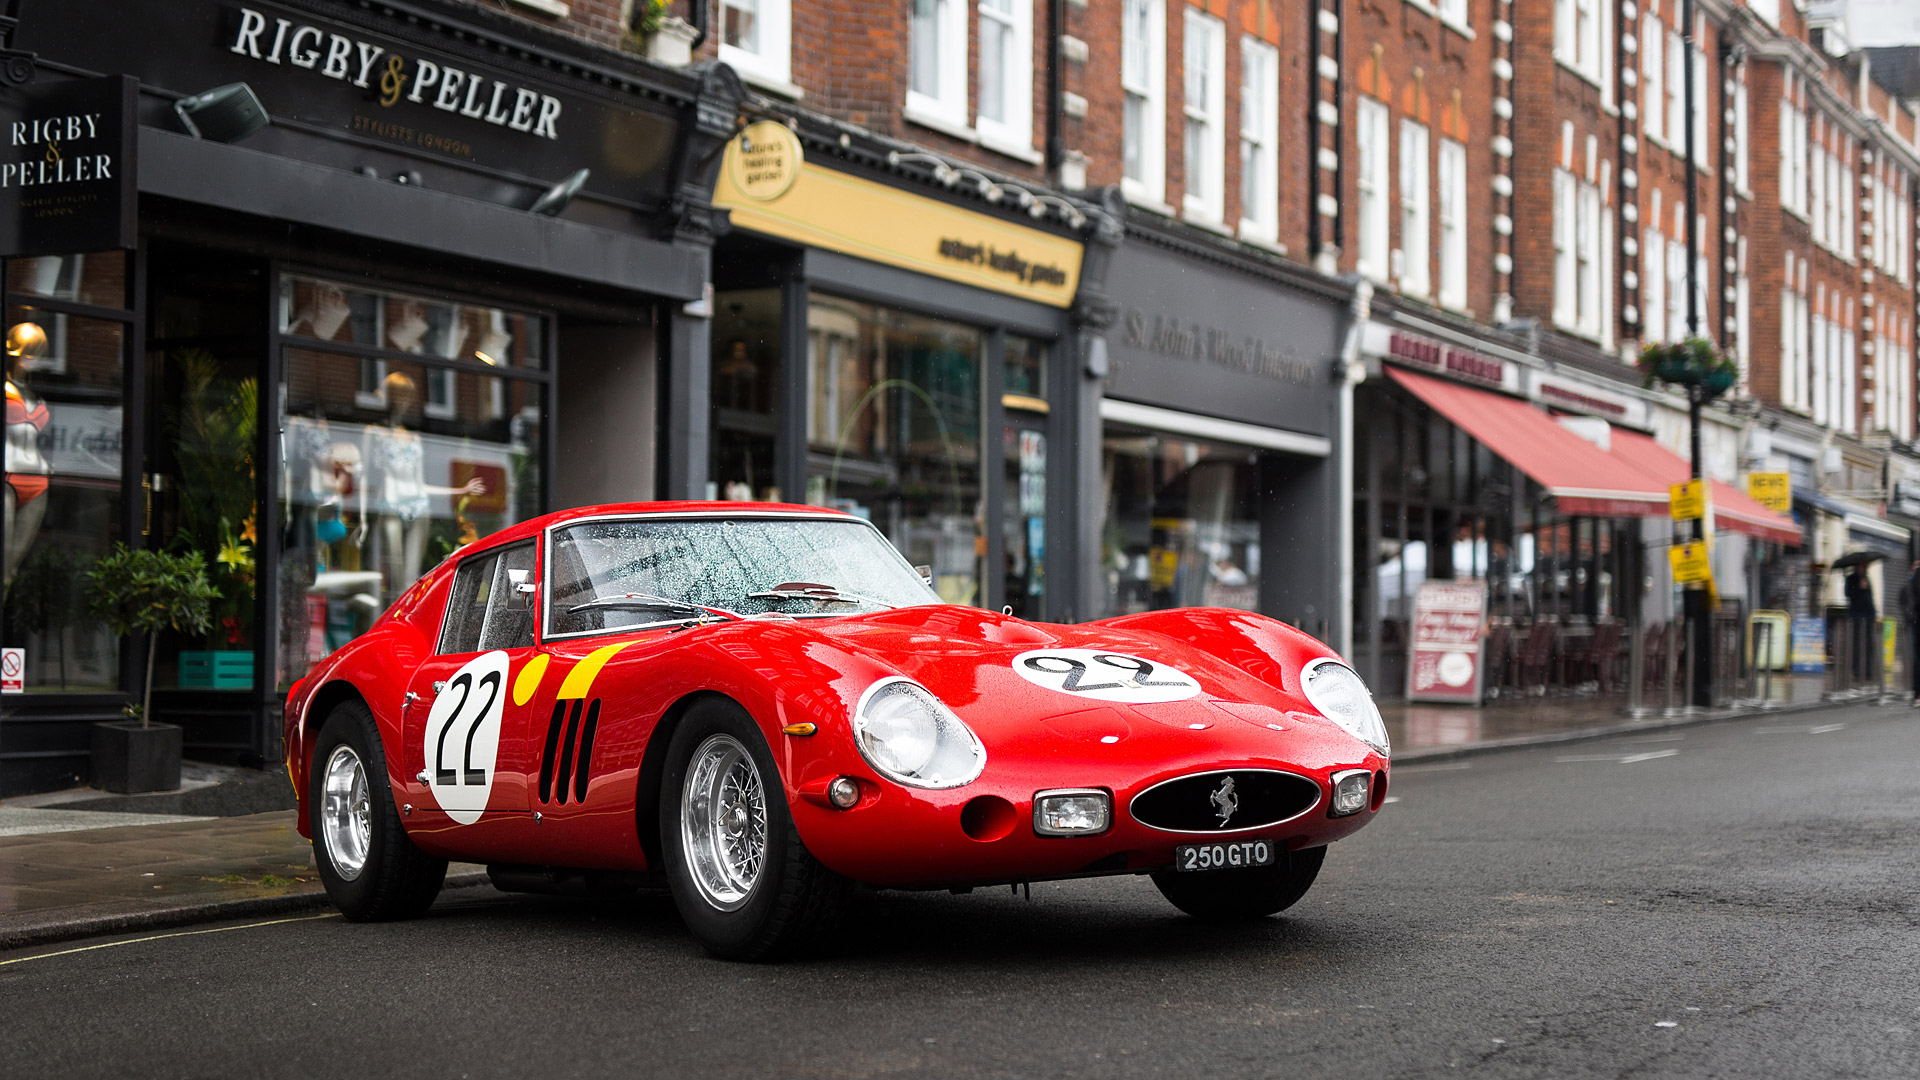 1962 Ferrari 250 GTO Wallpapers HD Images   WSupercars 1920x1080